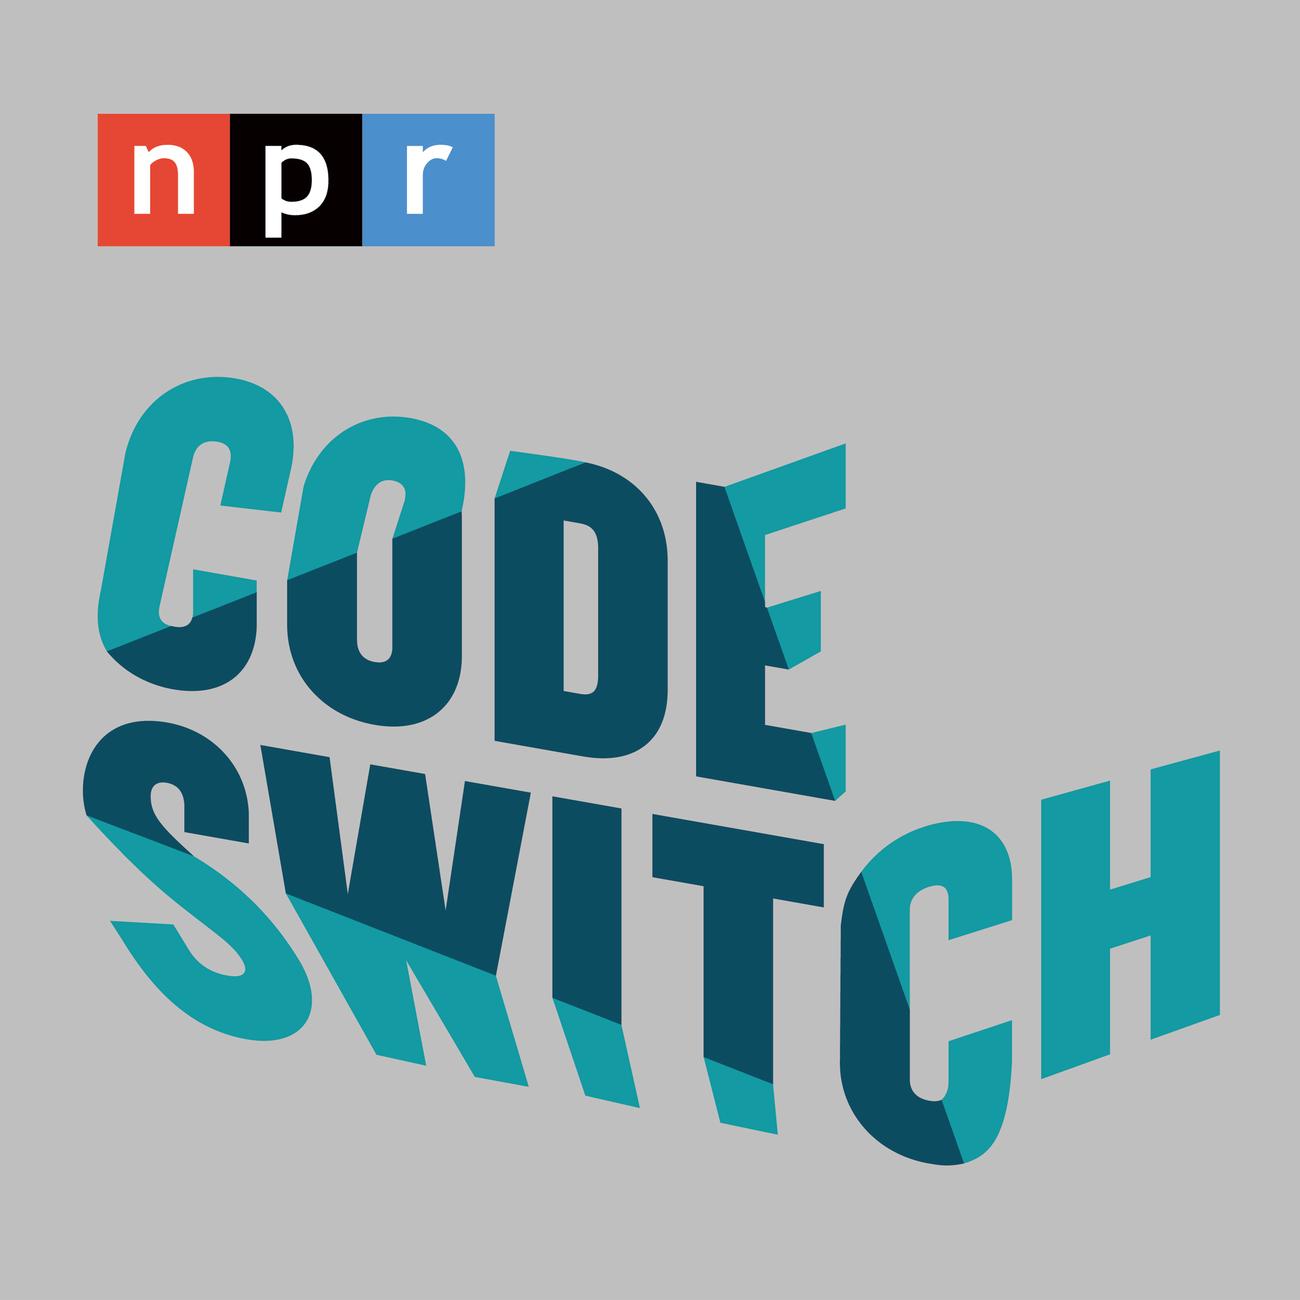 Code switch logo